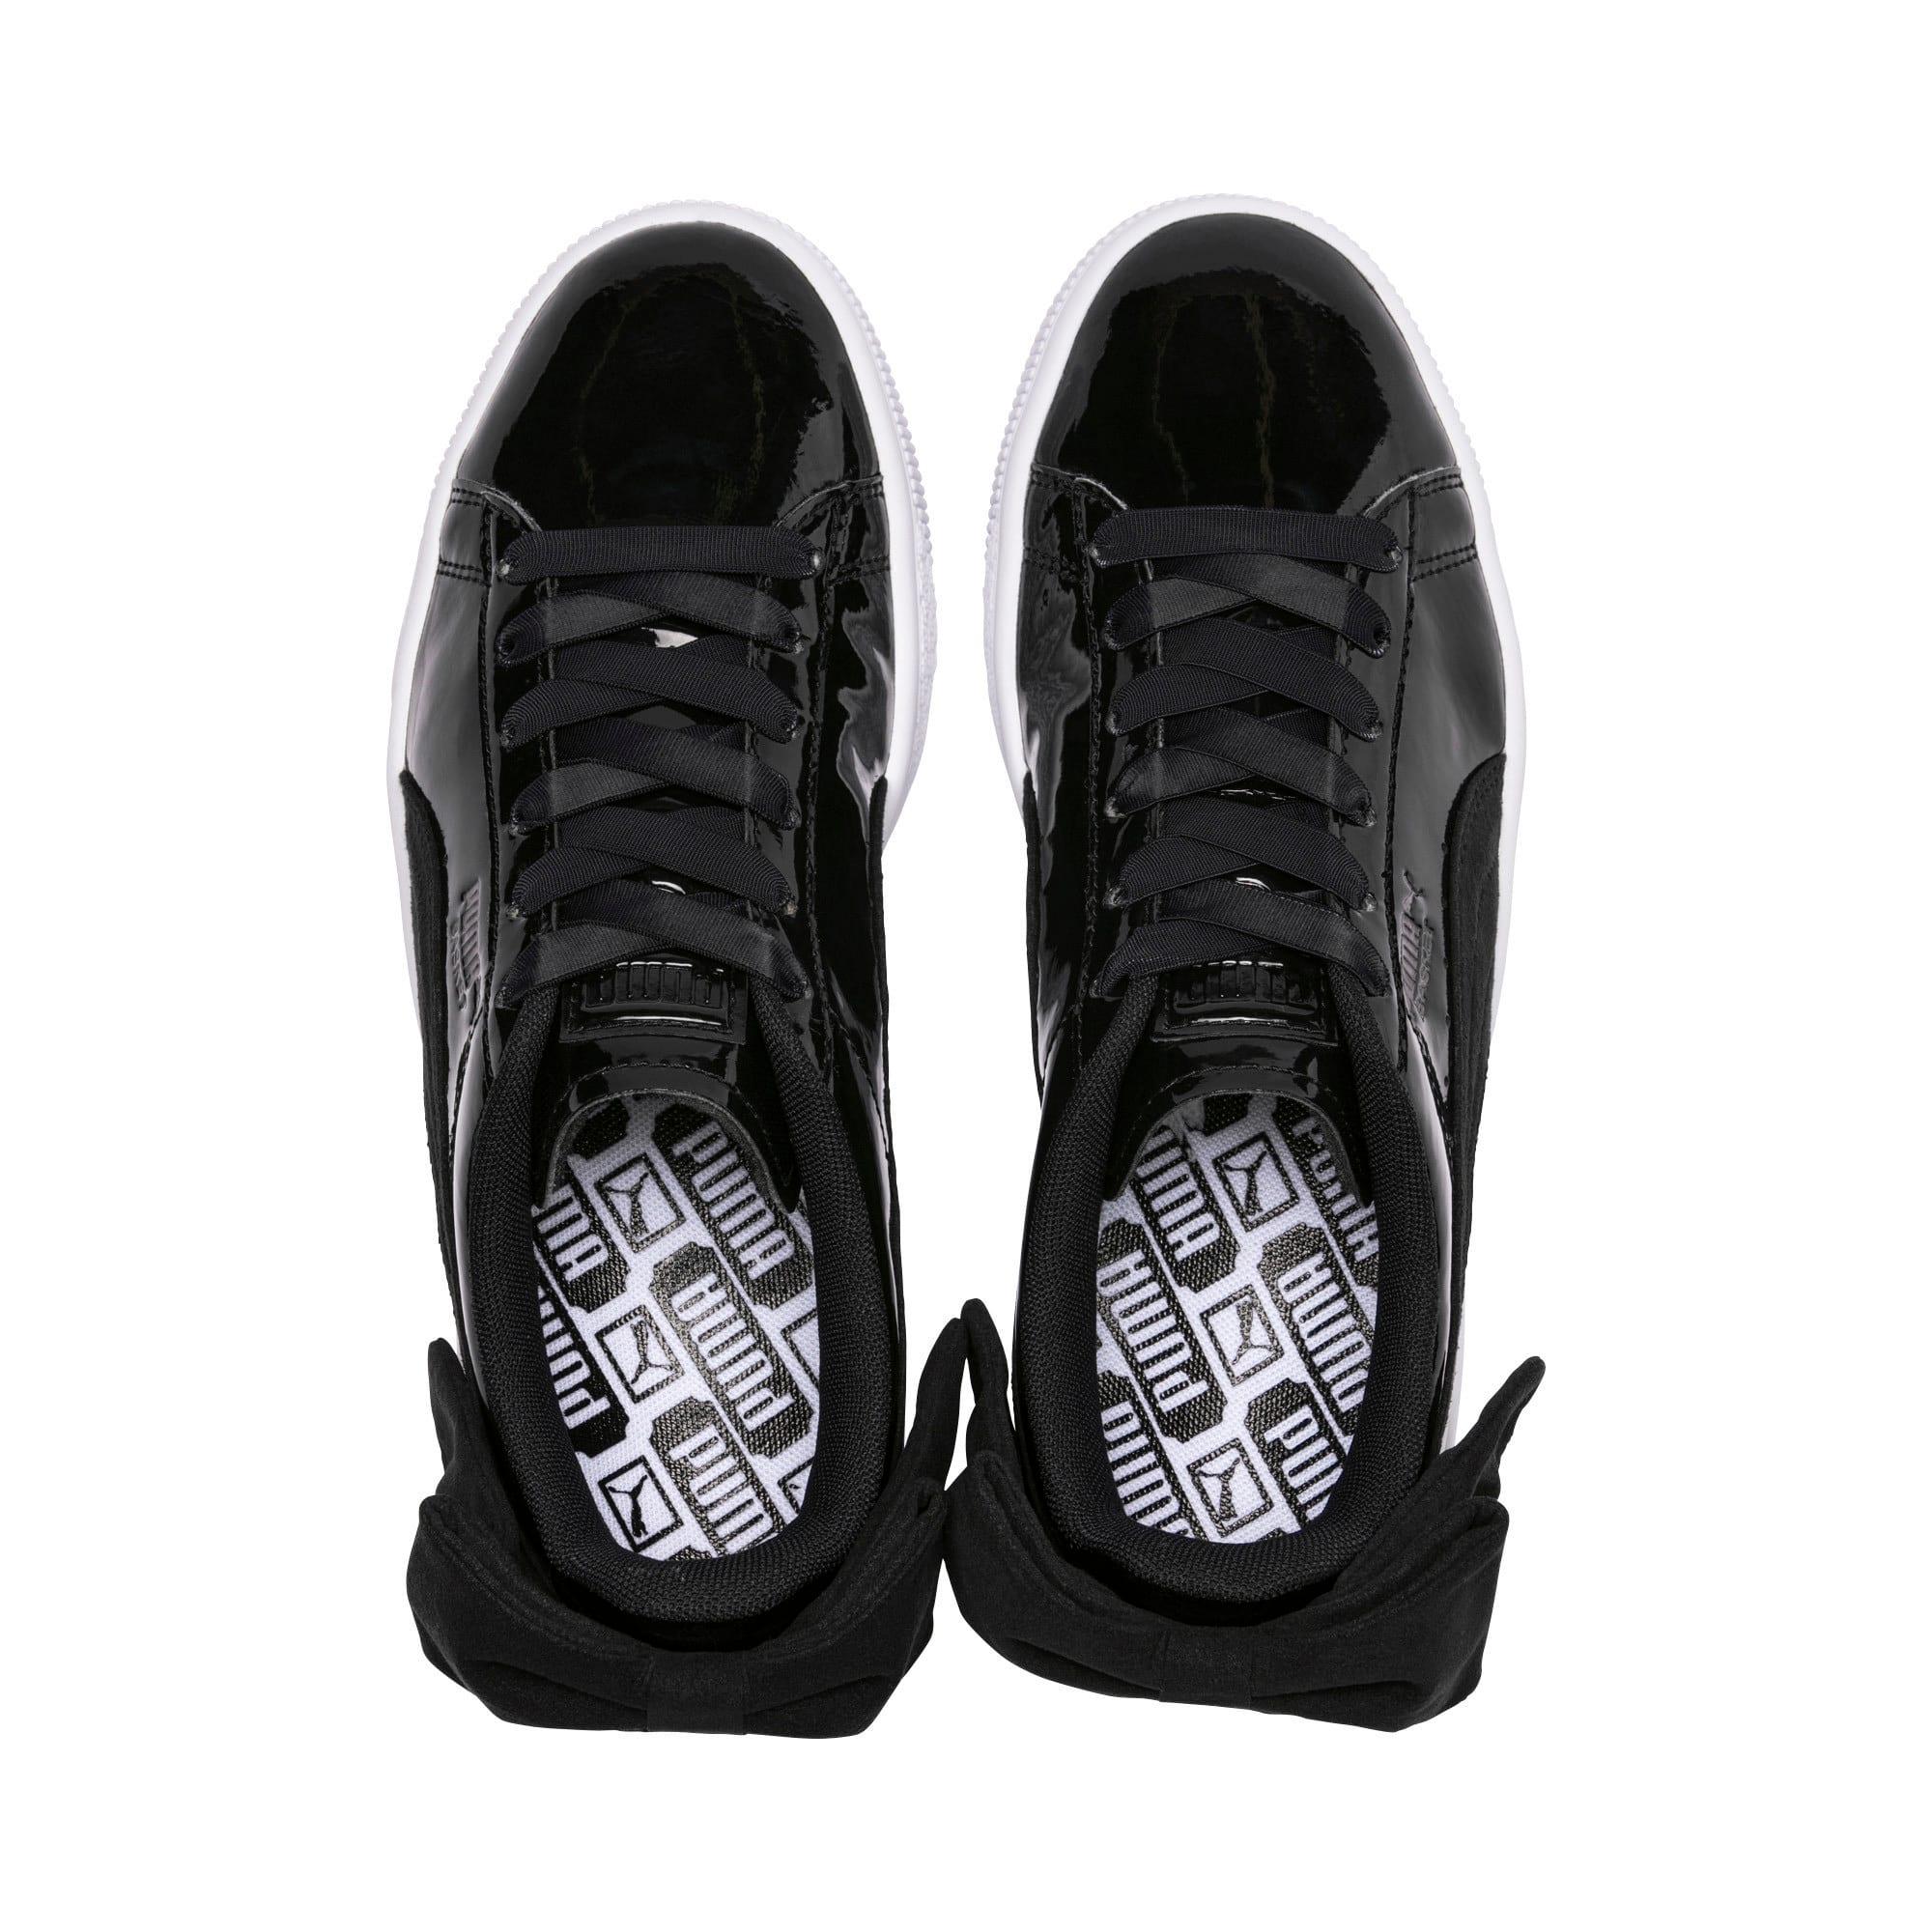 Thumbnail 6 of Basket Suede Bow Women's Sneakers, Puma Black-Puma Black, medium